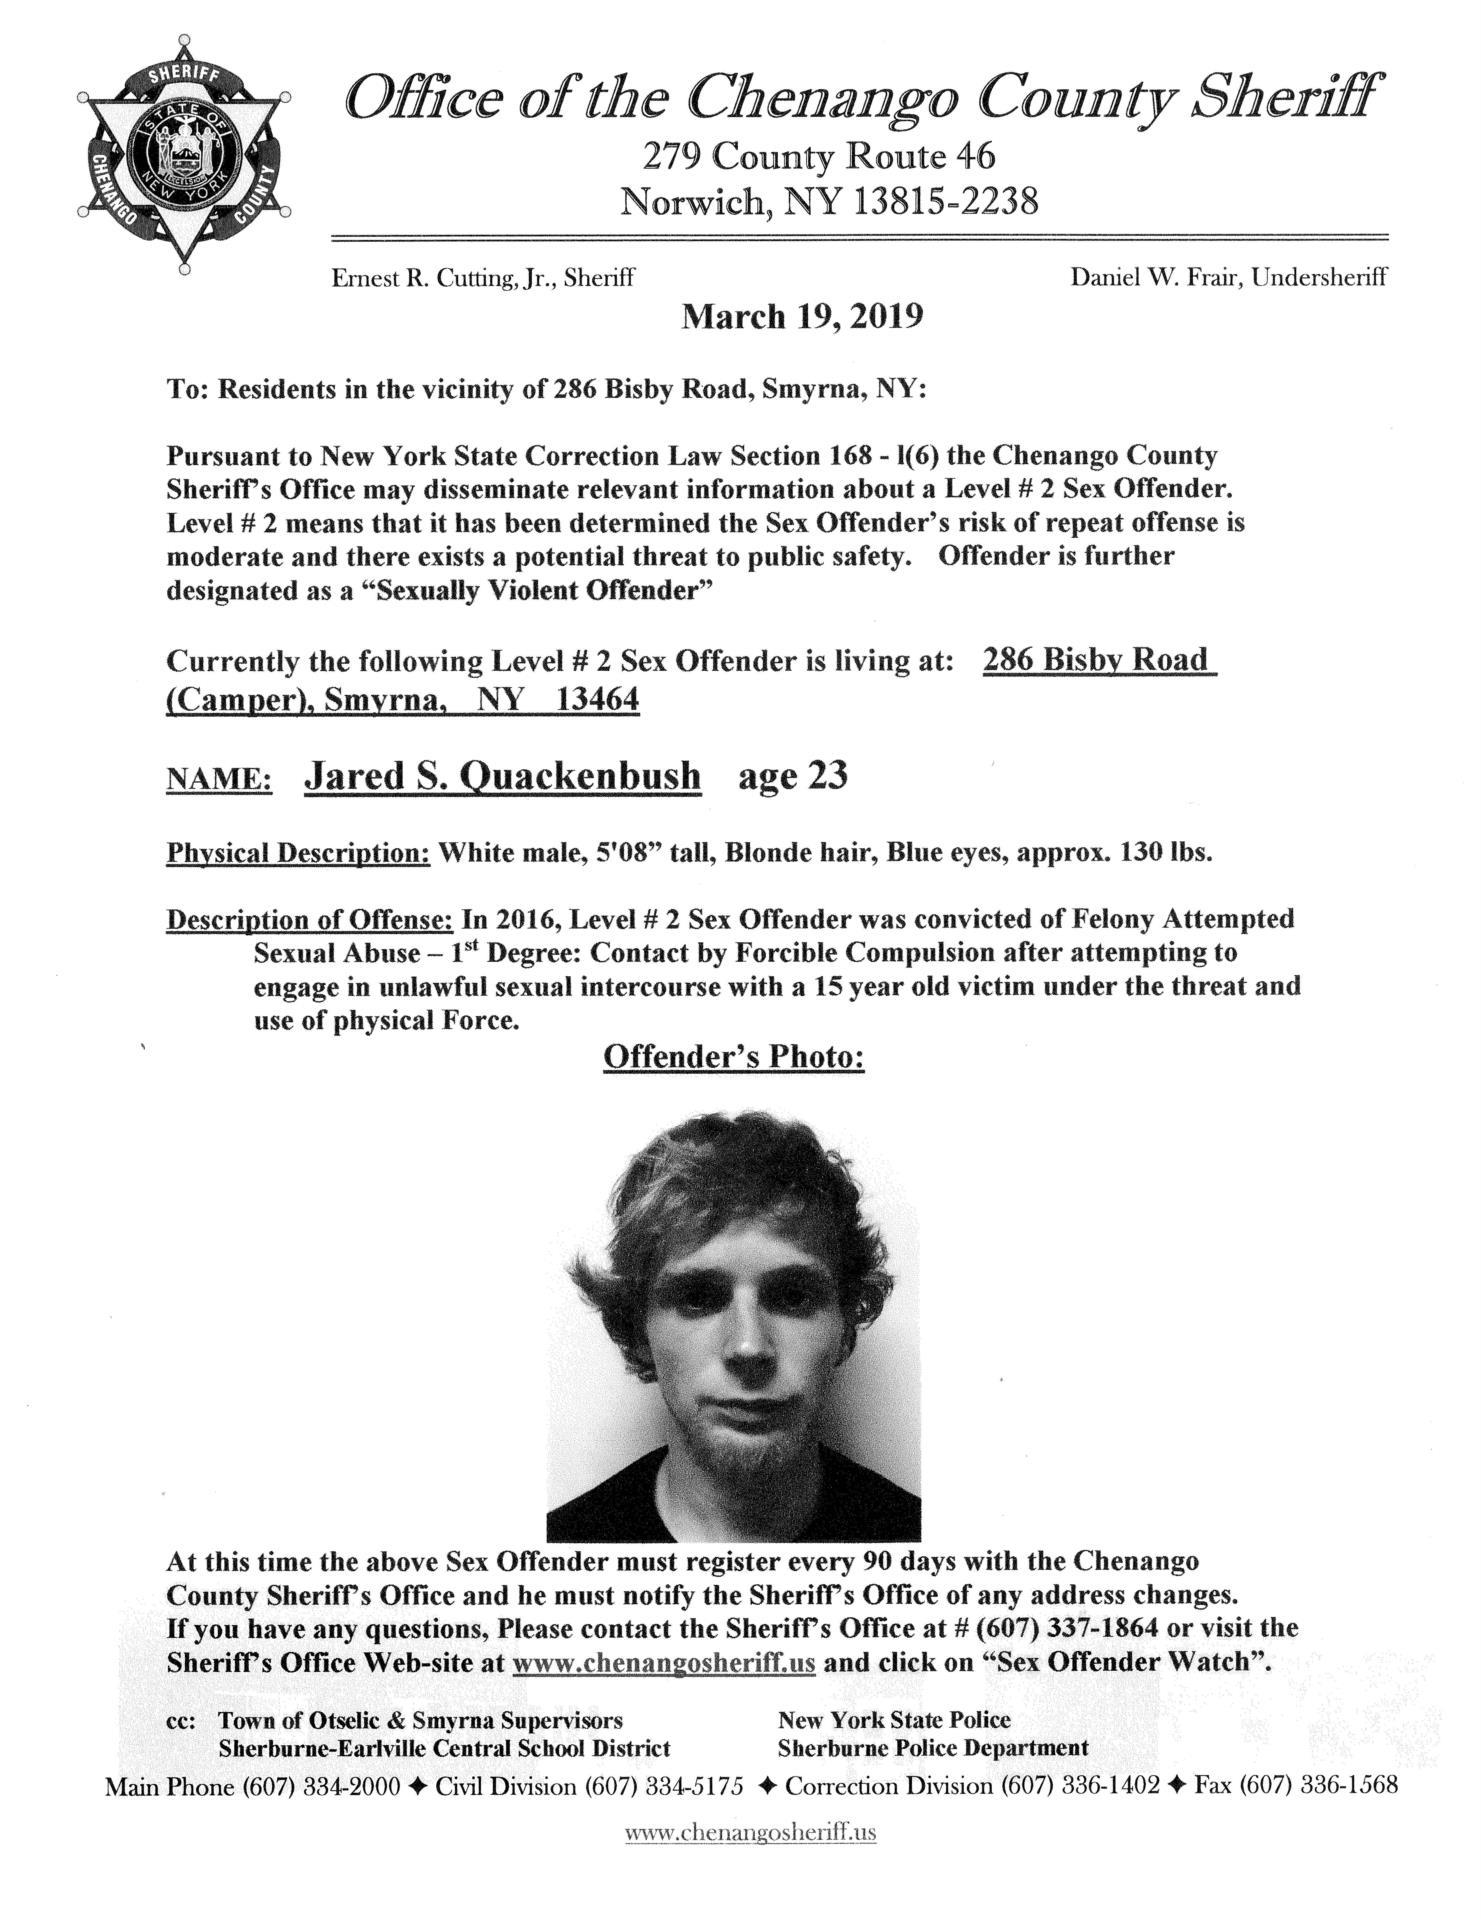 Sex Offender Quackenbush